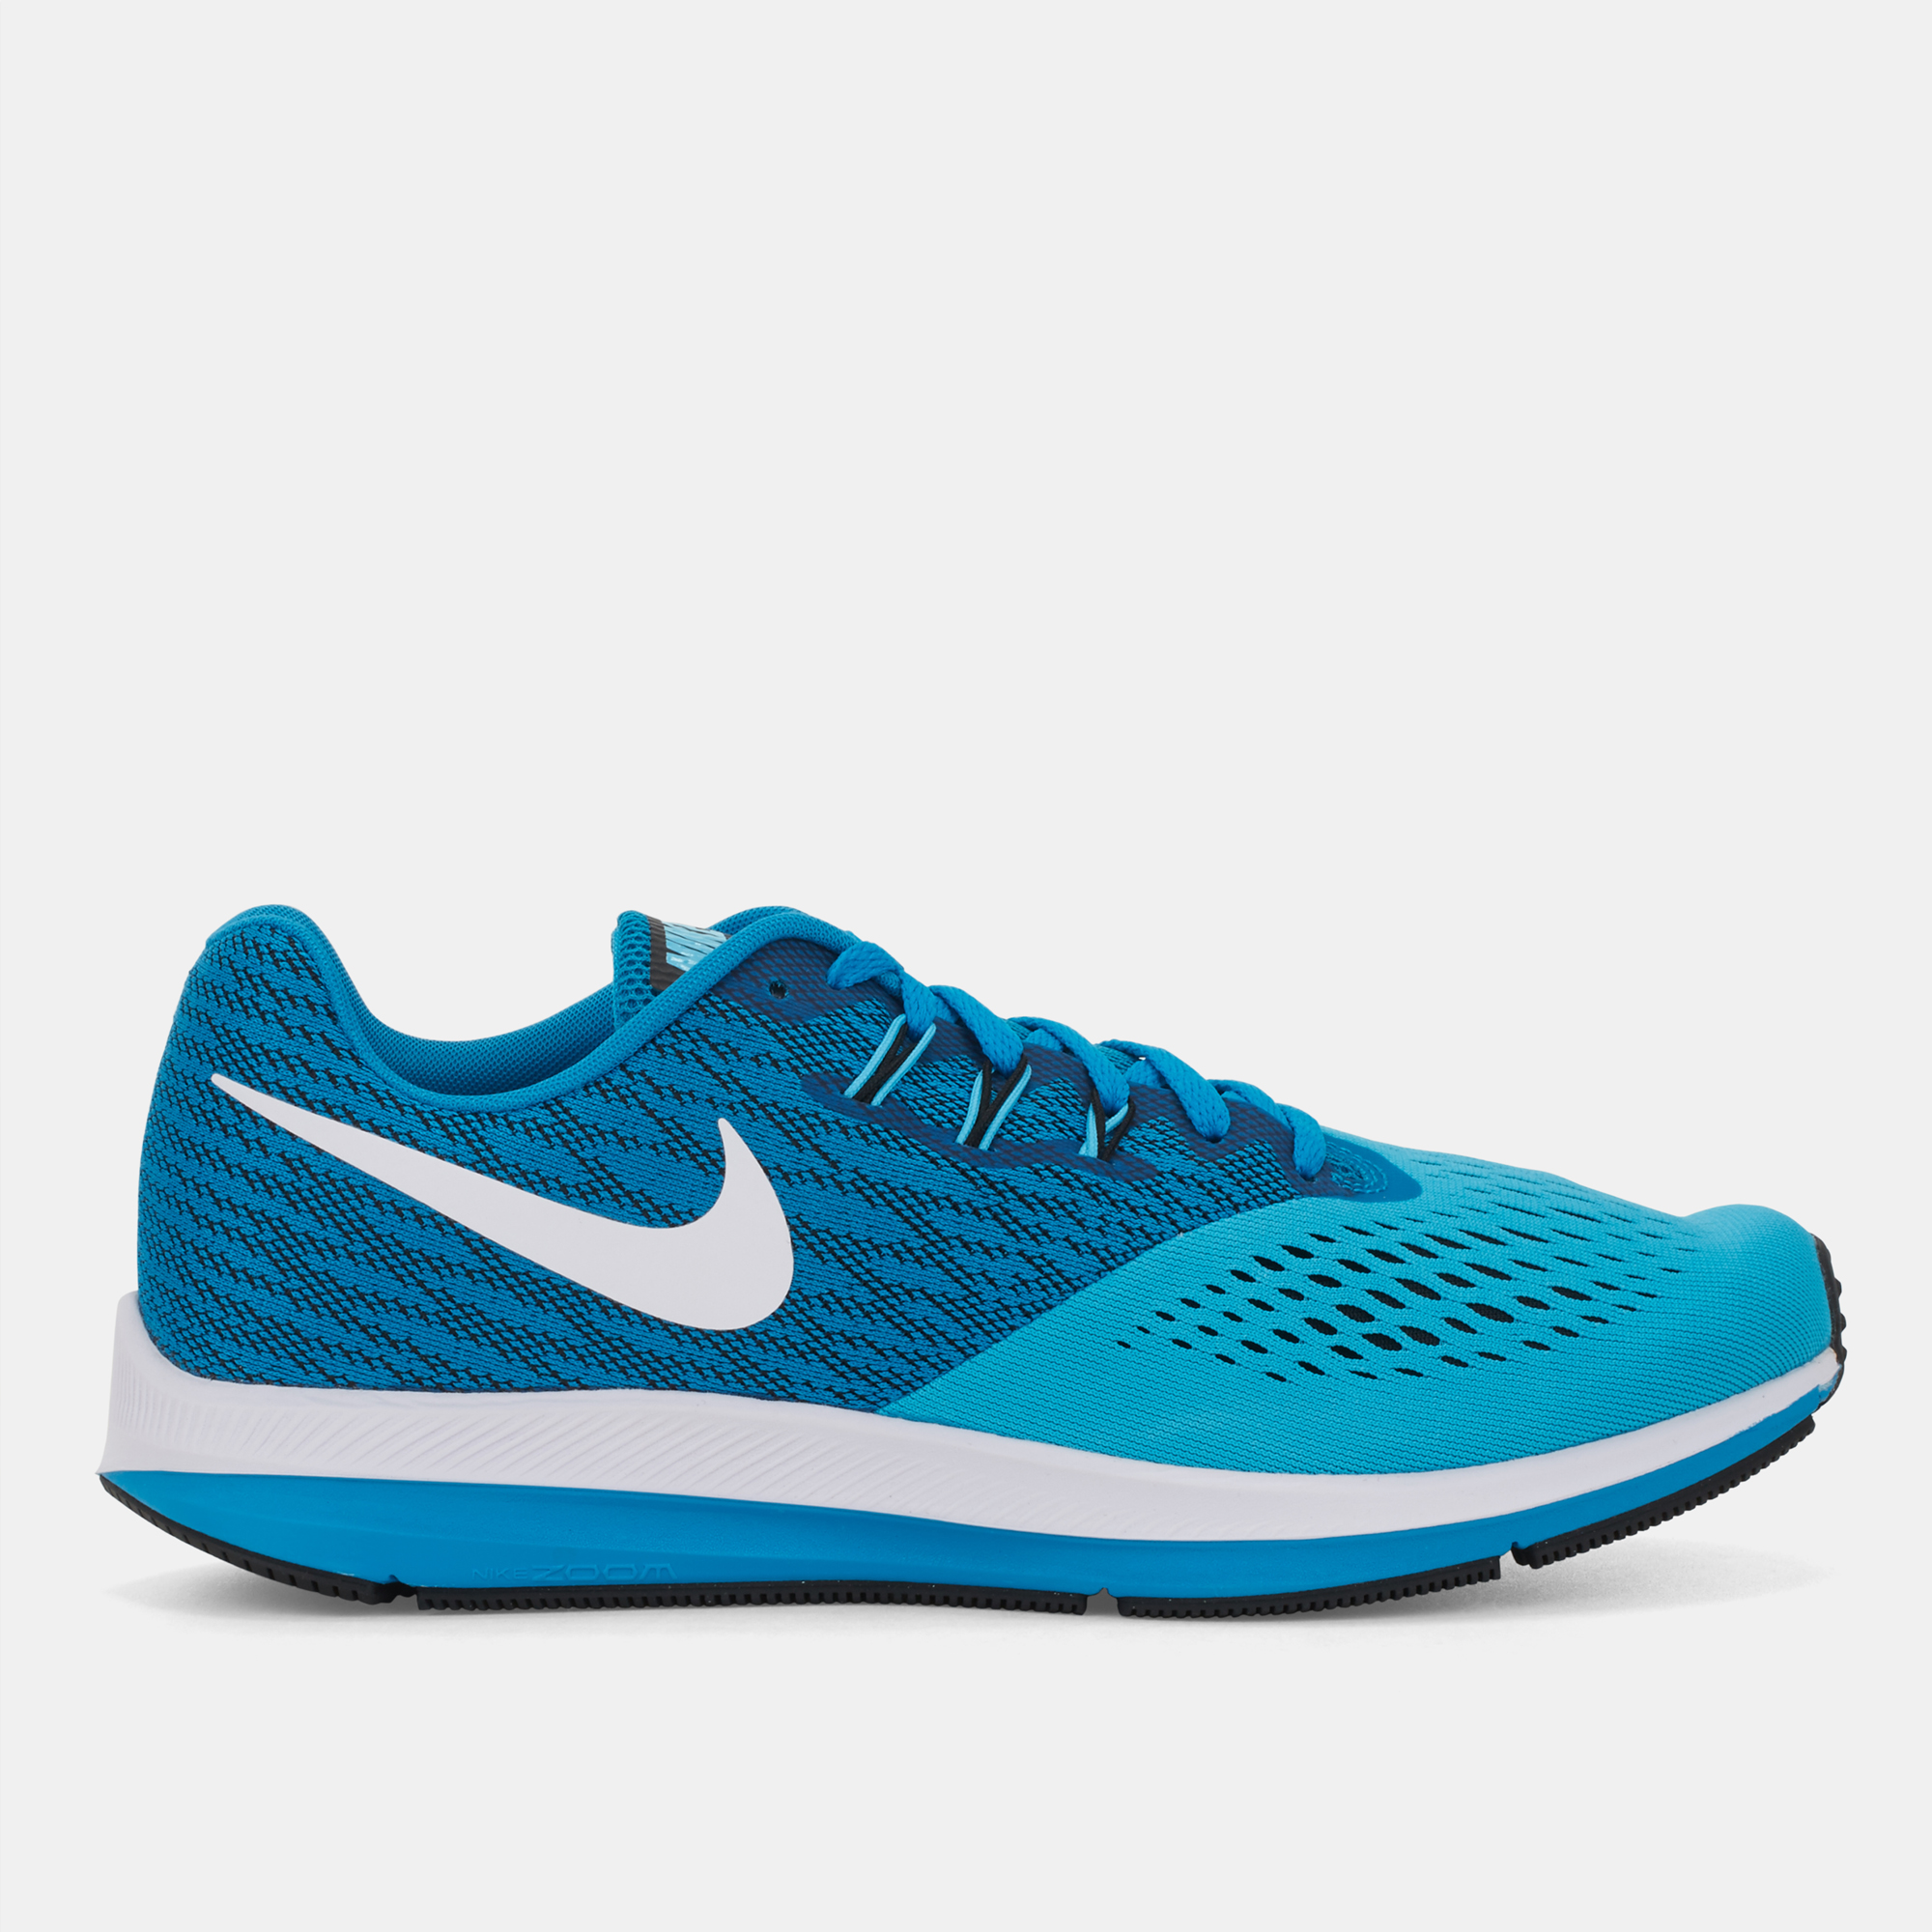 a048b8b52ec47 Nike Zoom Winflo 4 Running Shoe Nike898466 401 in Riyadh